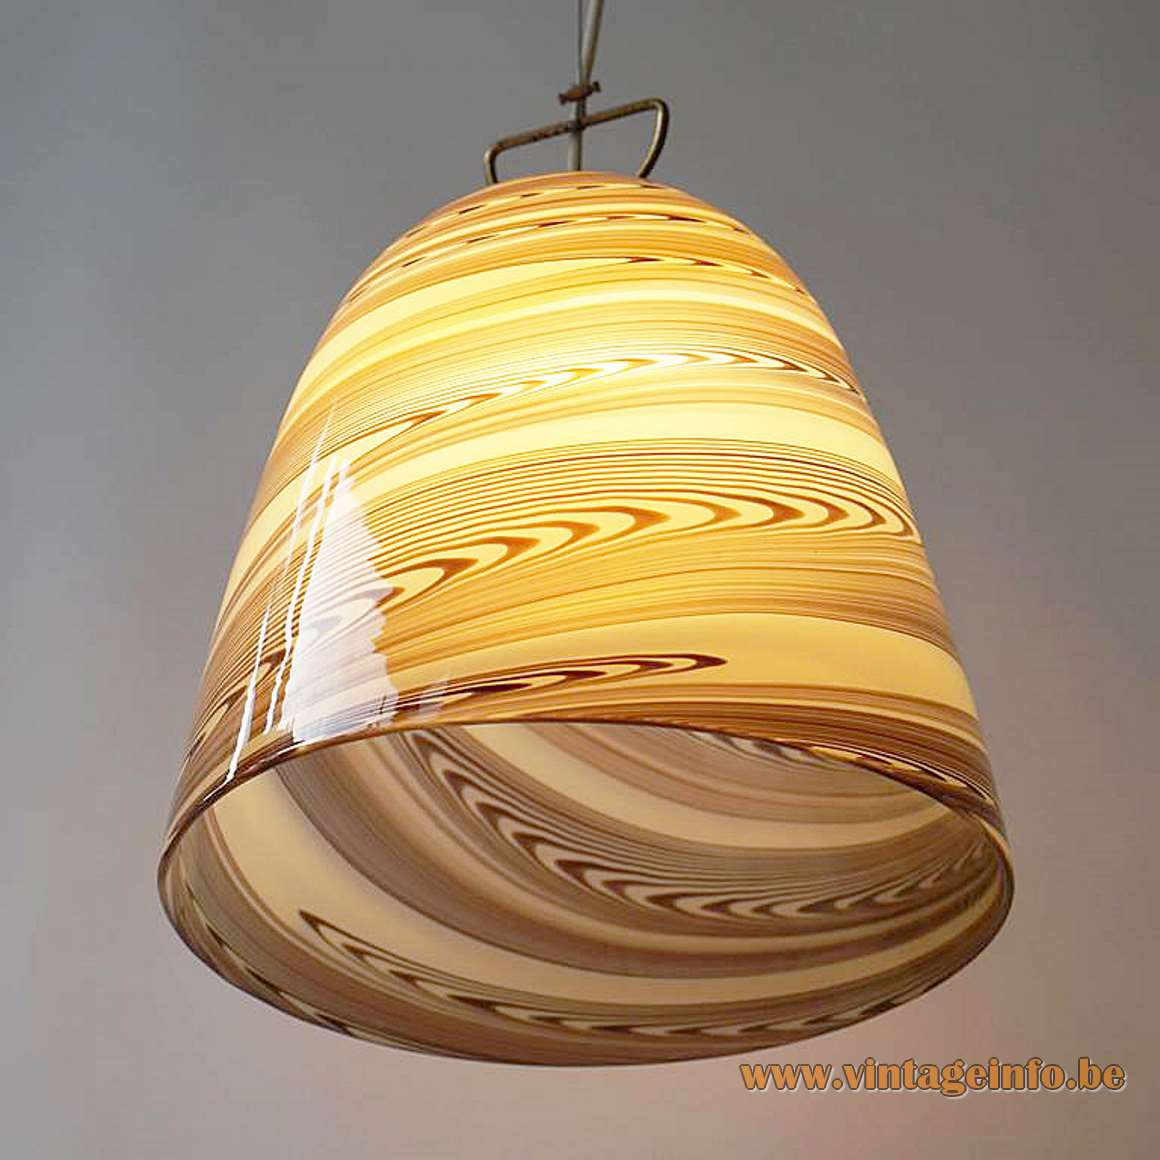 Stracciatella Murano bell pendant lamp clock swirl chocolata brown striped Kalmar Franken 1960s 1970s Mid-Century Modern